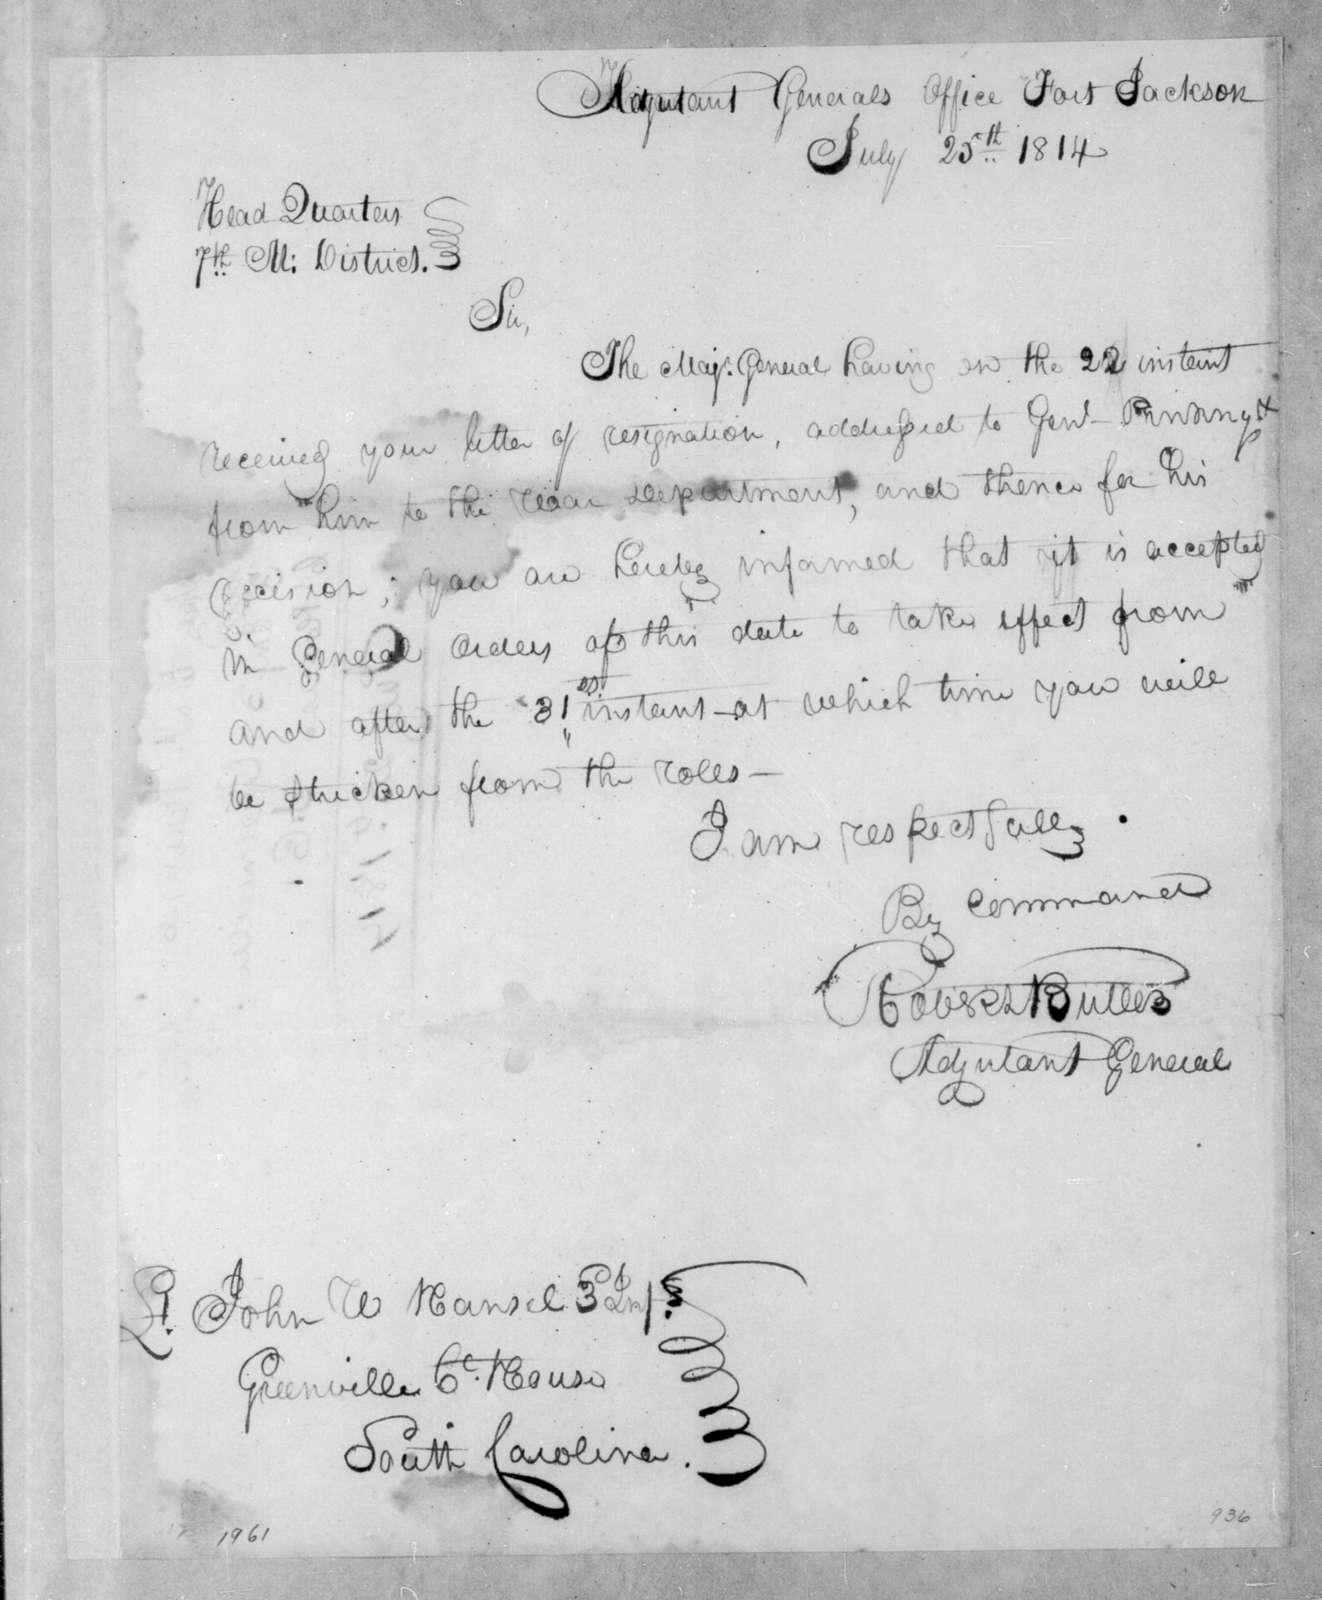 Robert Butler to John W. Hansel, July 25, 1814